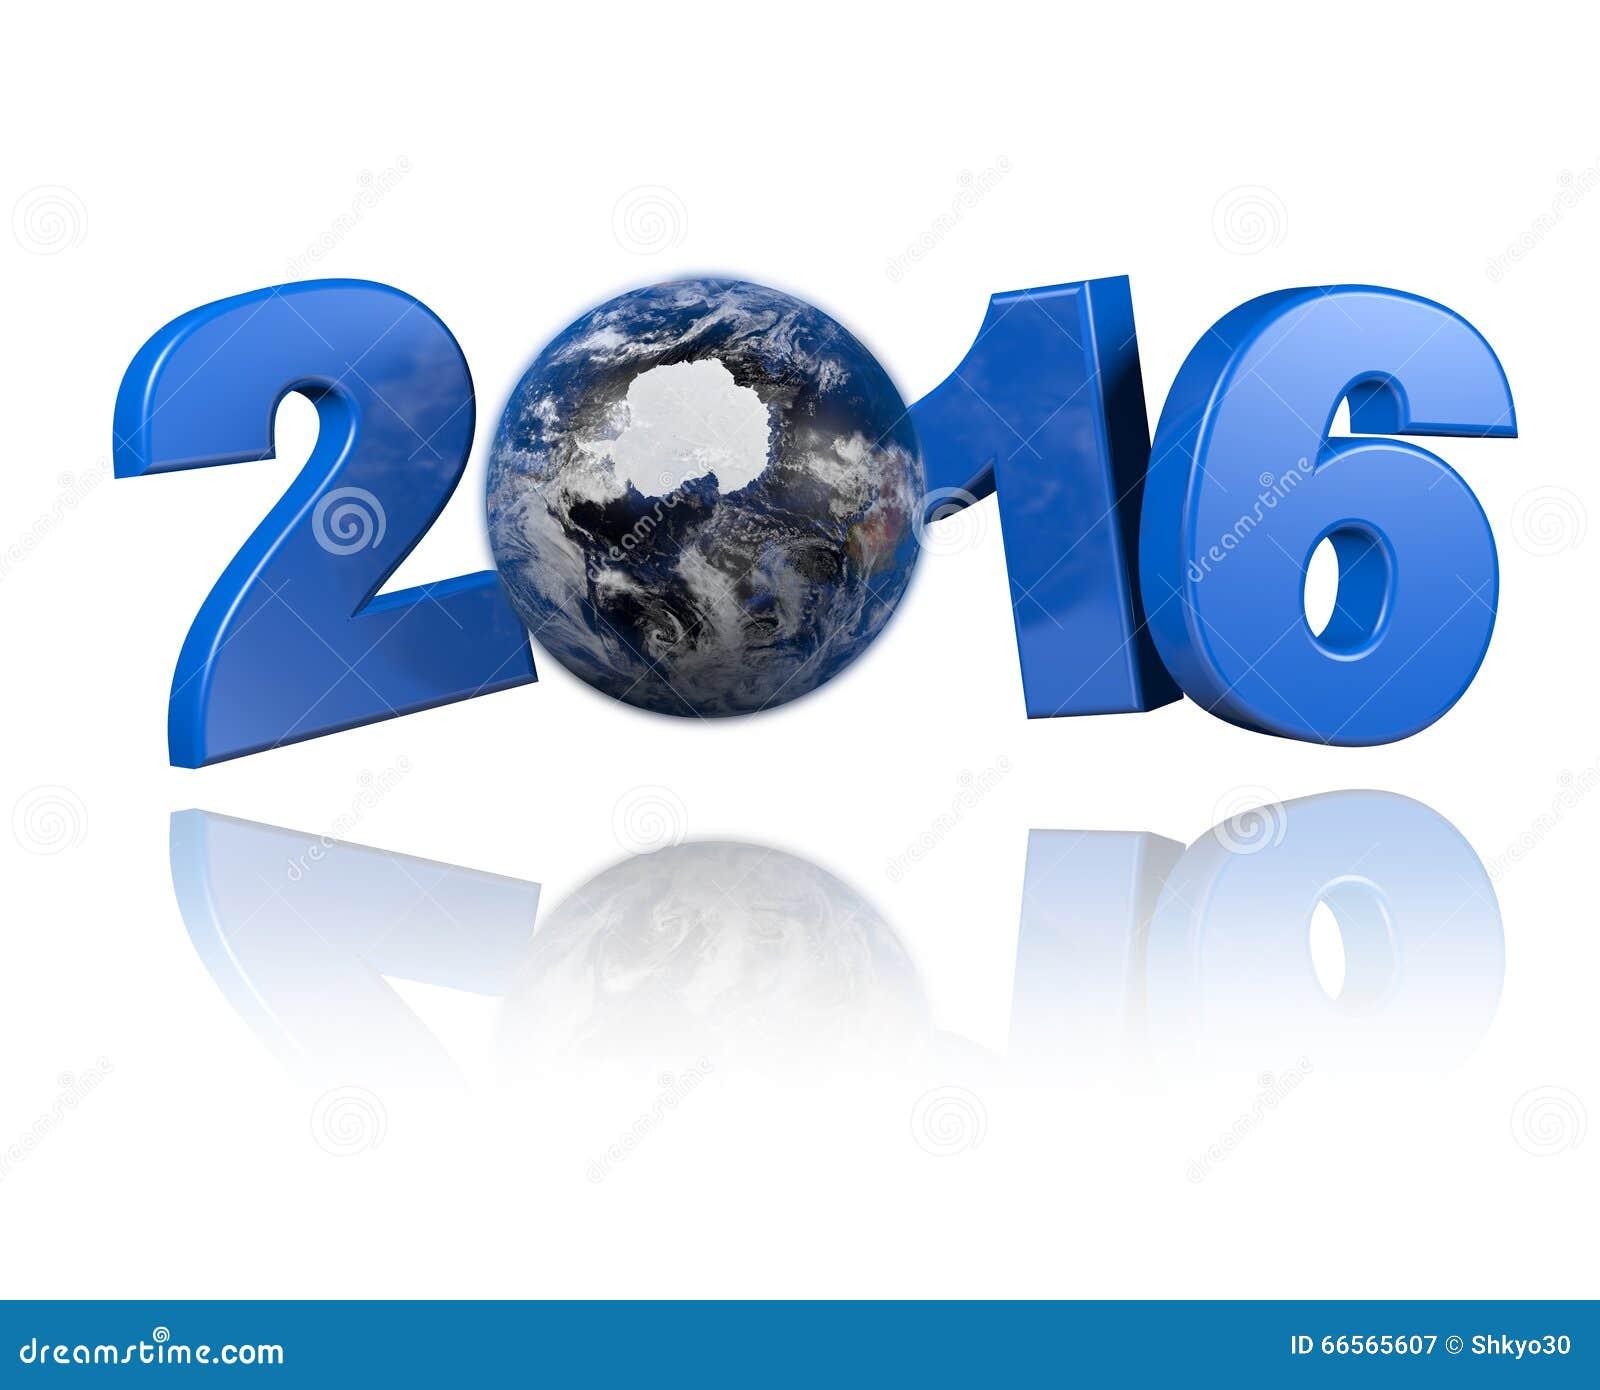 Antarctica centered Earth view 2016 design